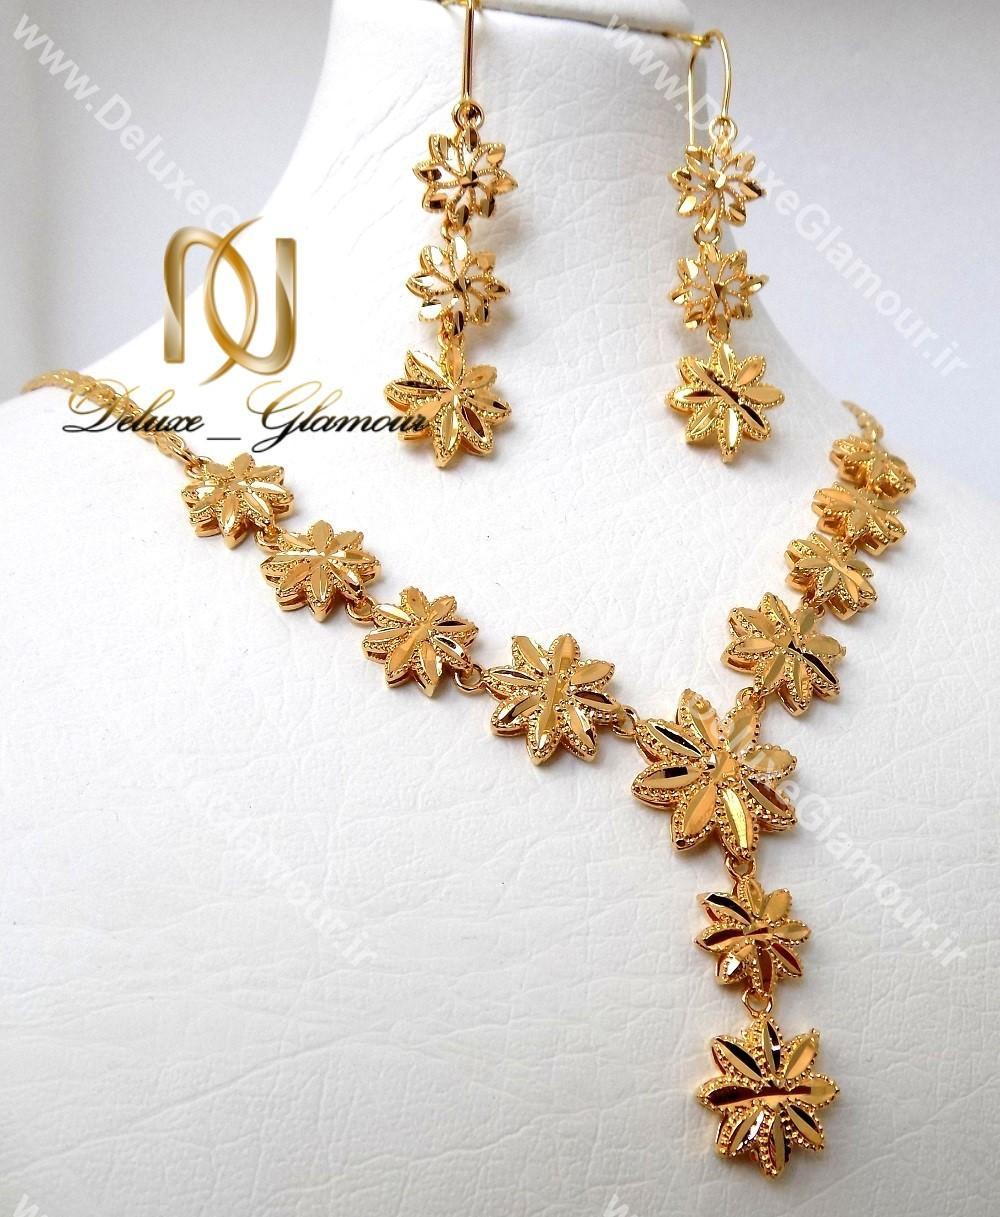 نیم ست زنانه طلایی برنجی طرح طلا کد NS-n112